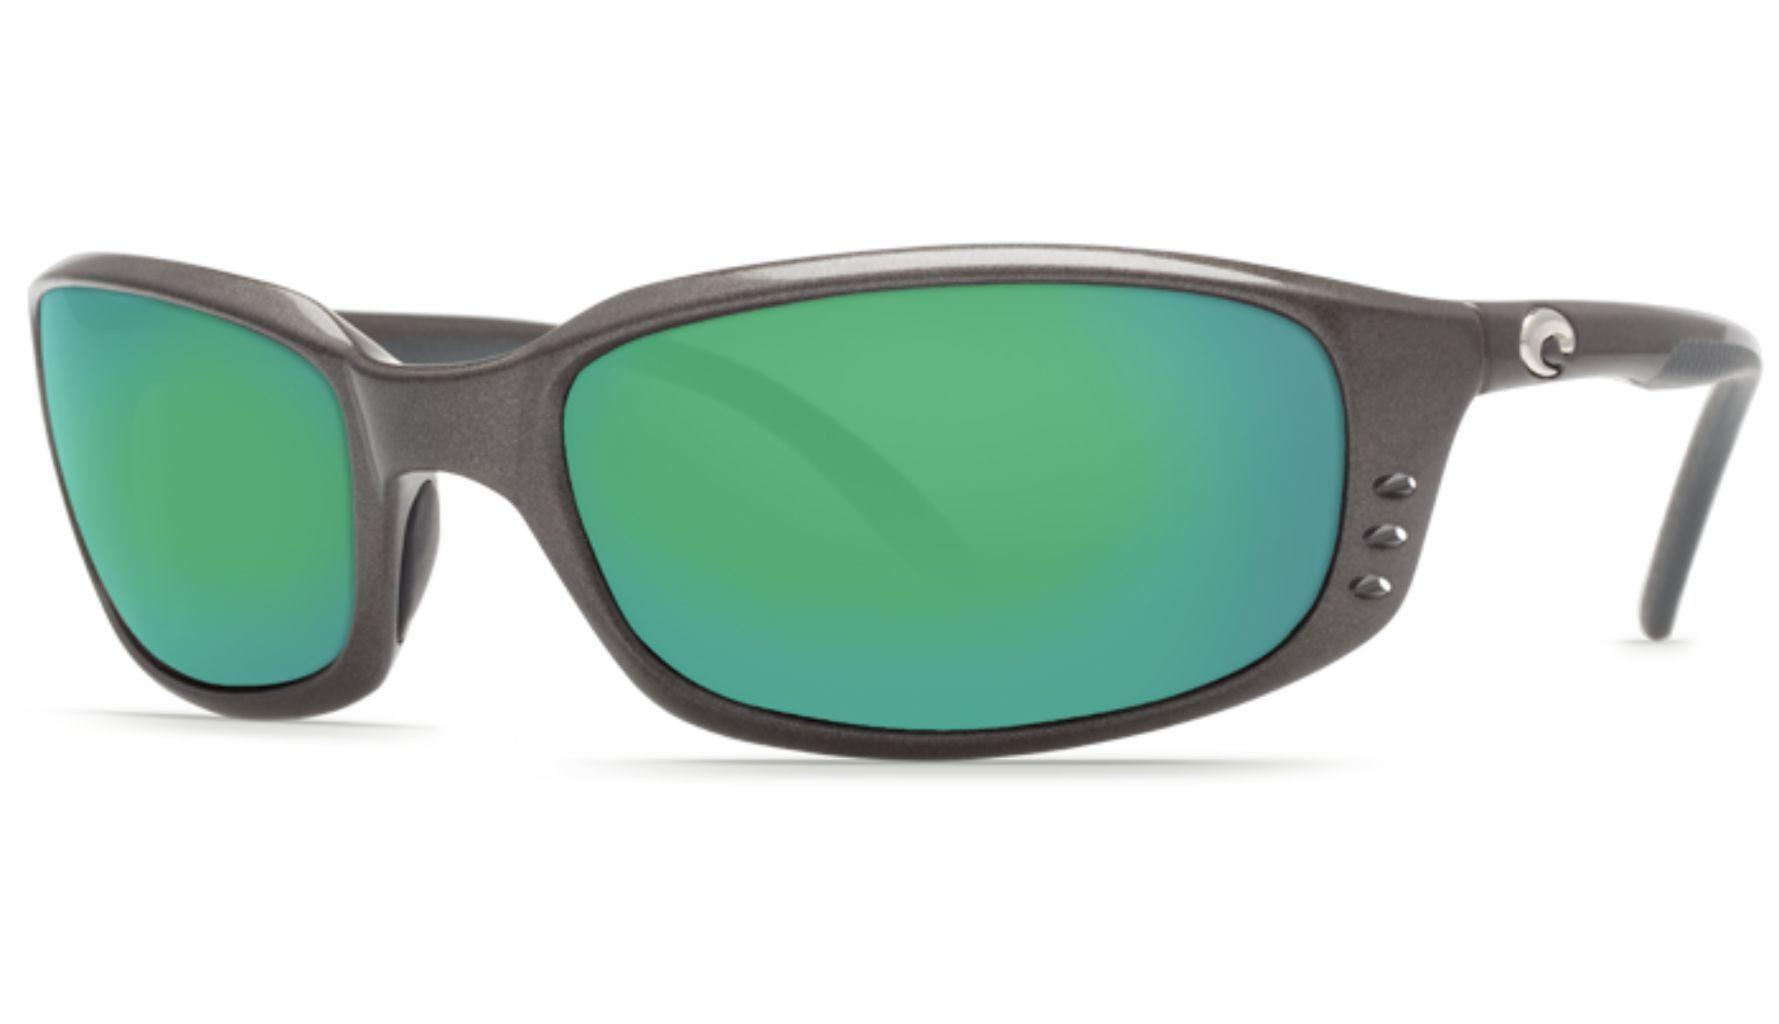 aa5e86c27582 Costa Brine Sunglasses | Products | Sunglasses, Top sunglasses ...